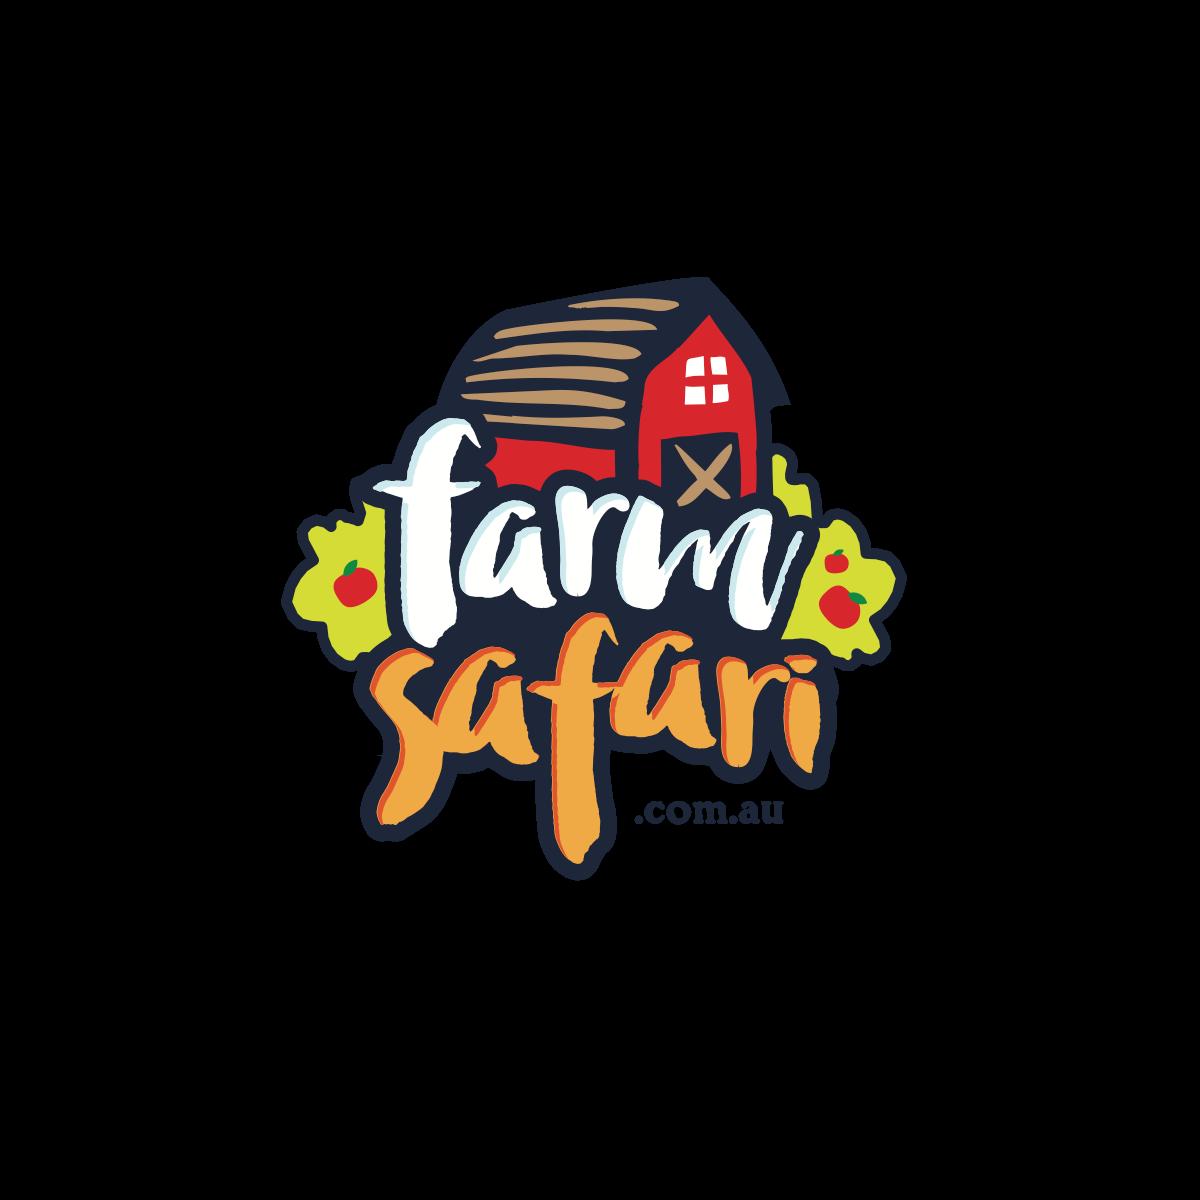 FarmSafari.com.au